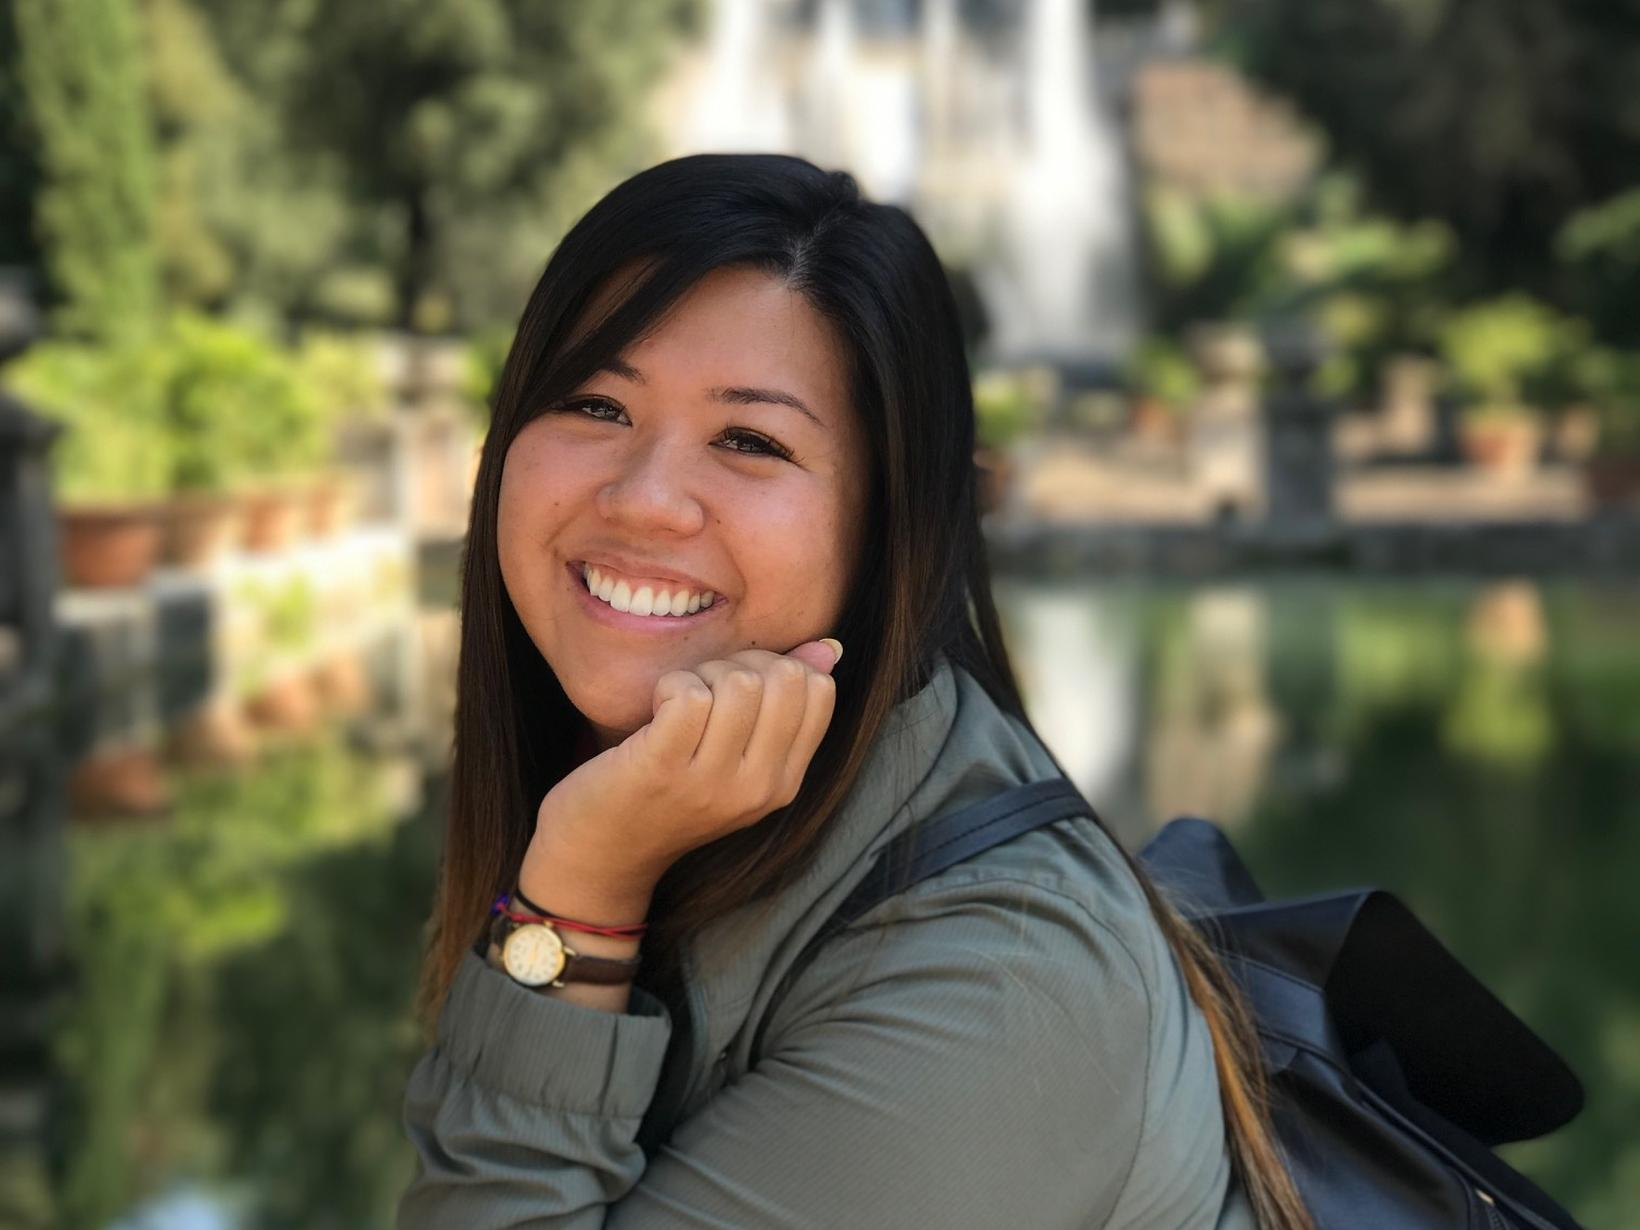 Monique from Pasadena, California, United States